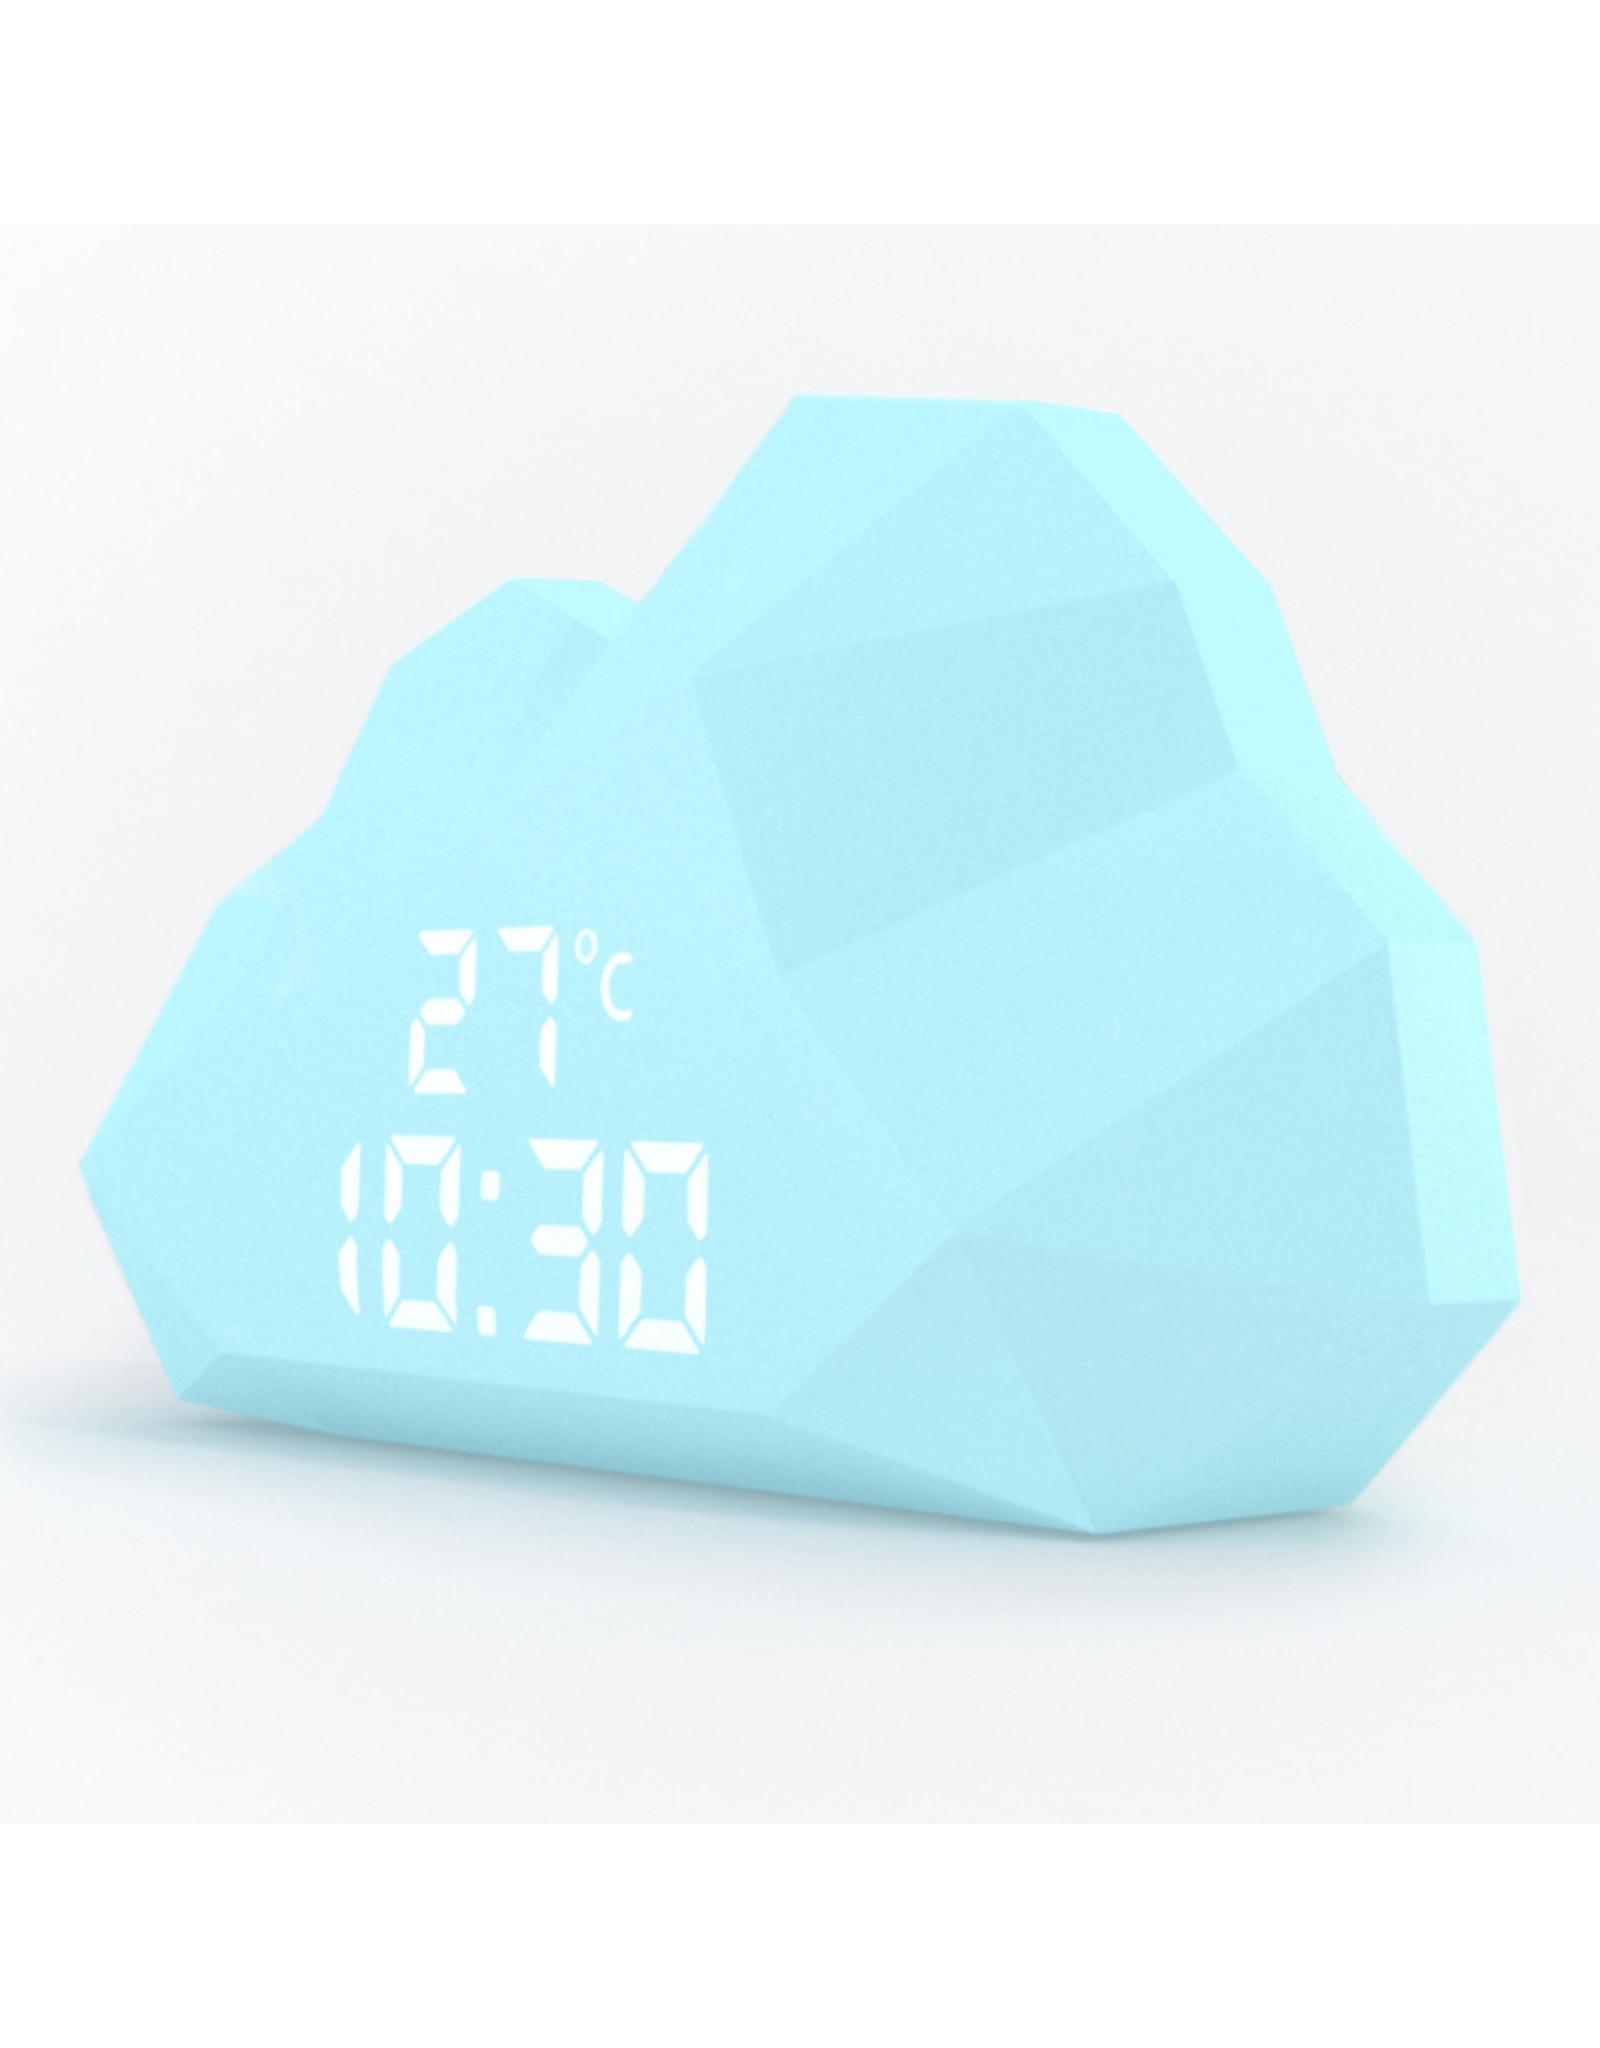 MOB Réveil nuage intelligent - Vert